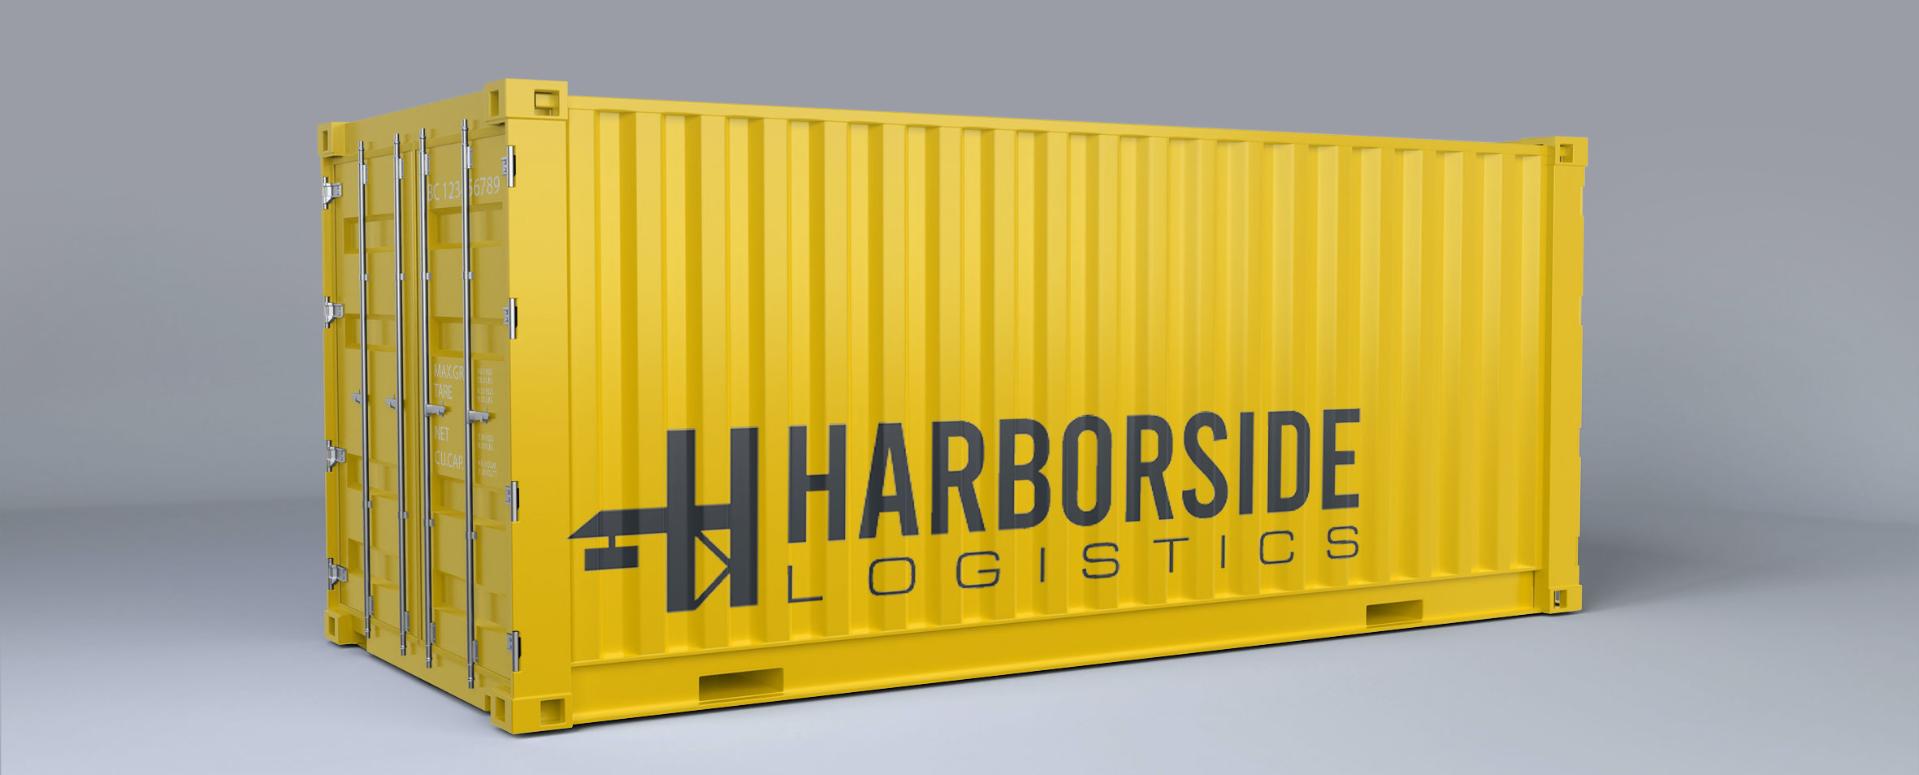 harborside-container